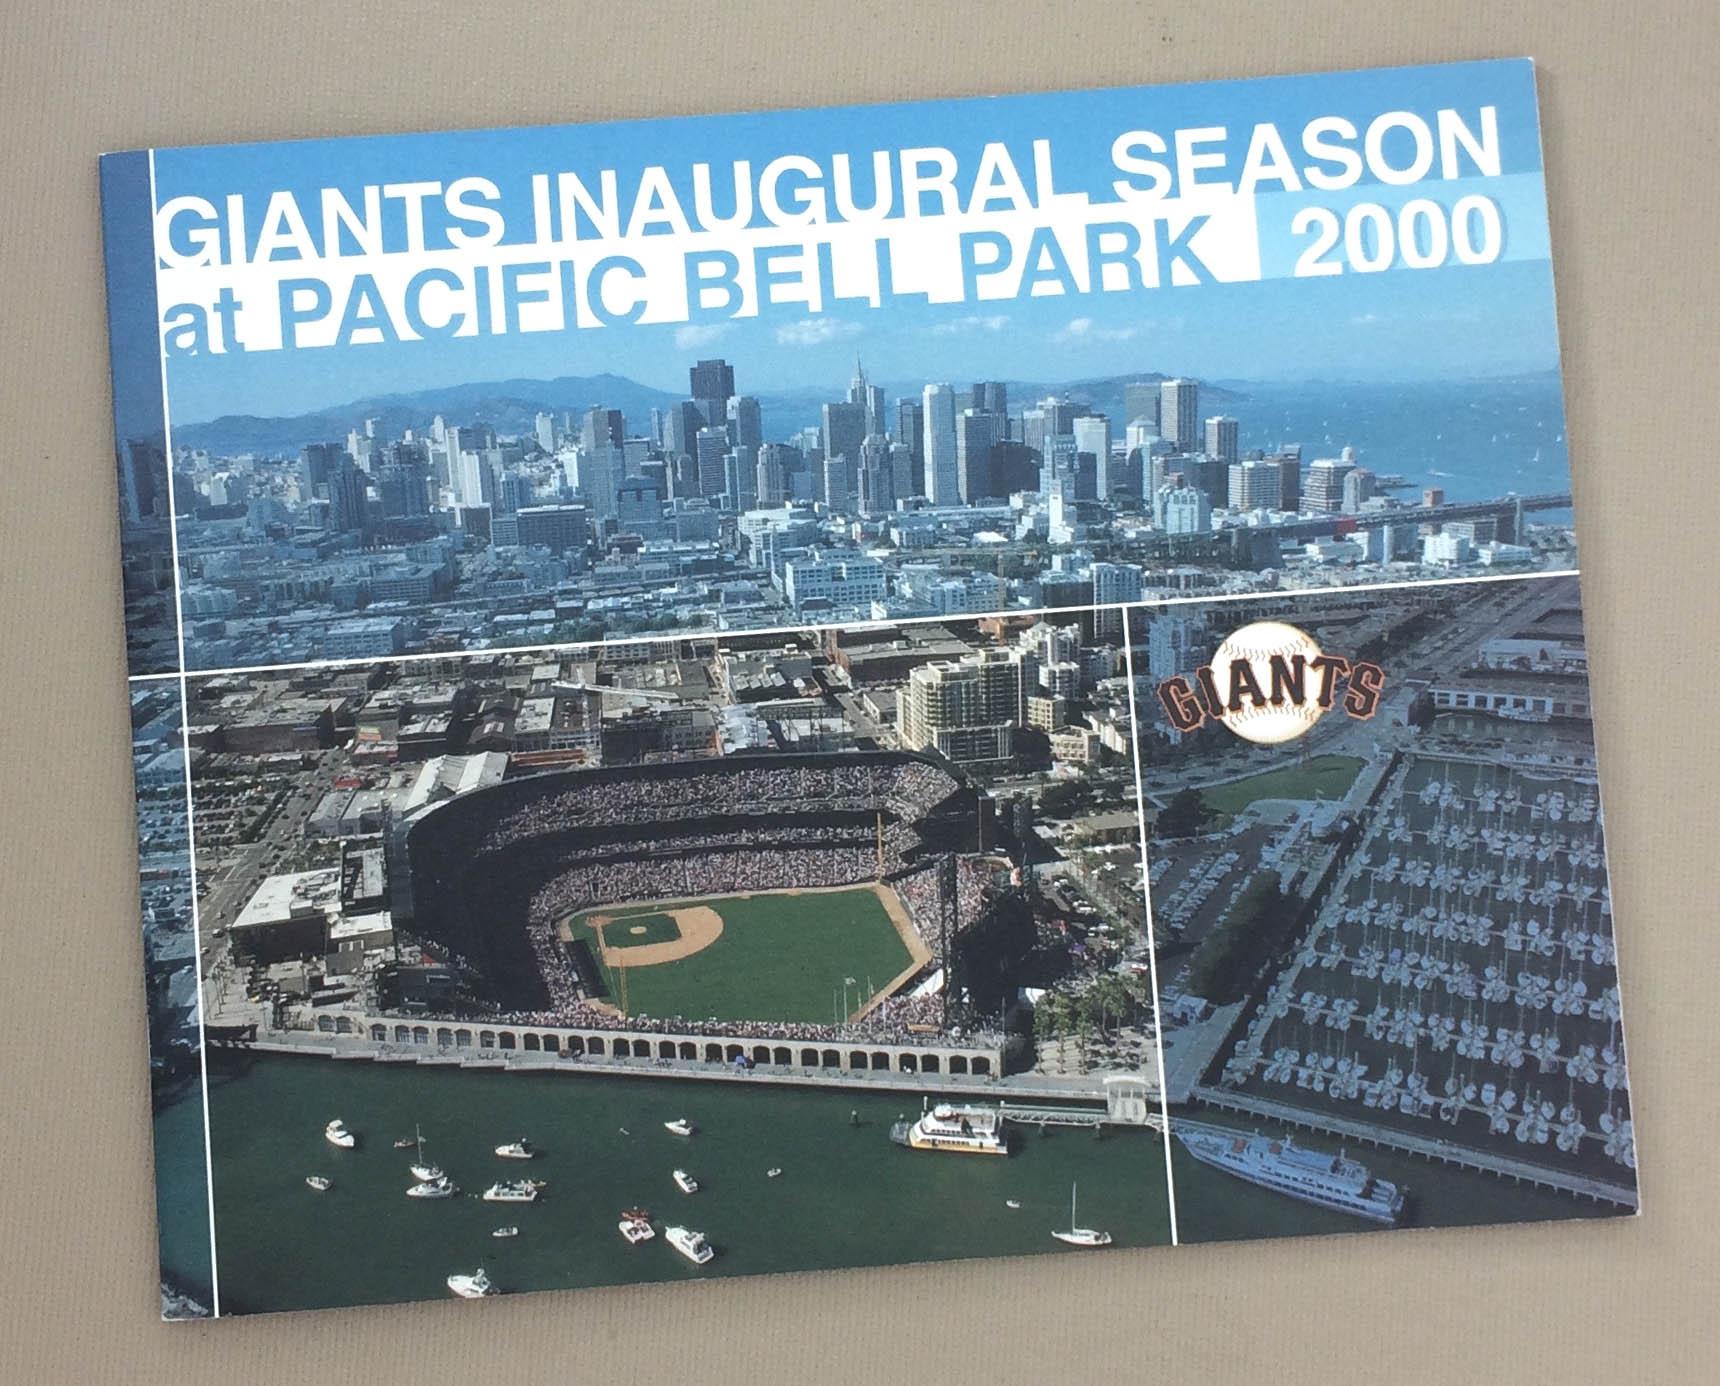 Inaugural Season Pacific Bell Park